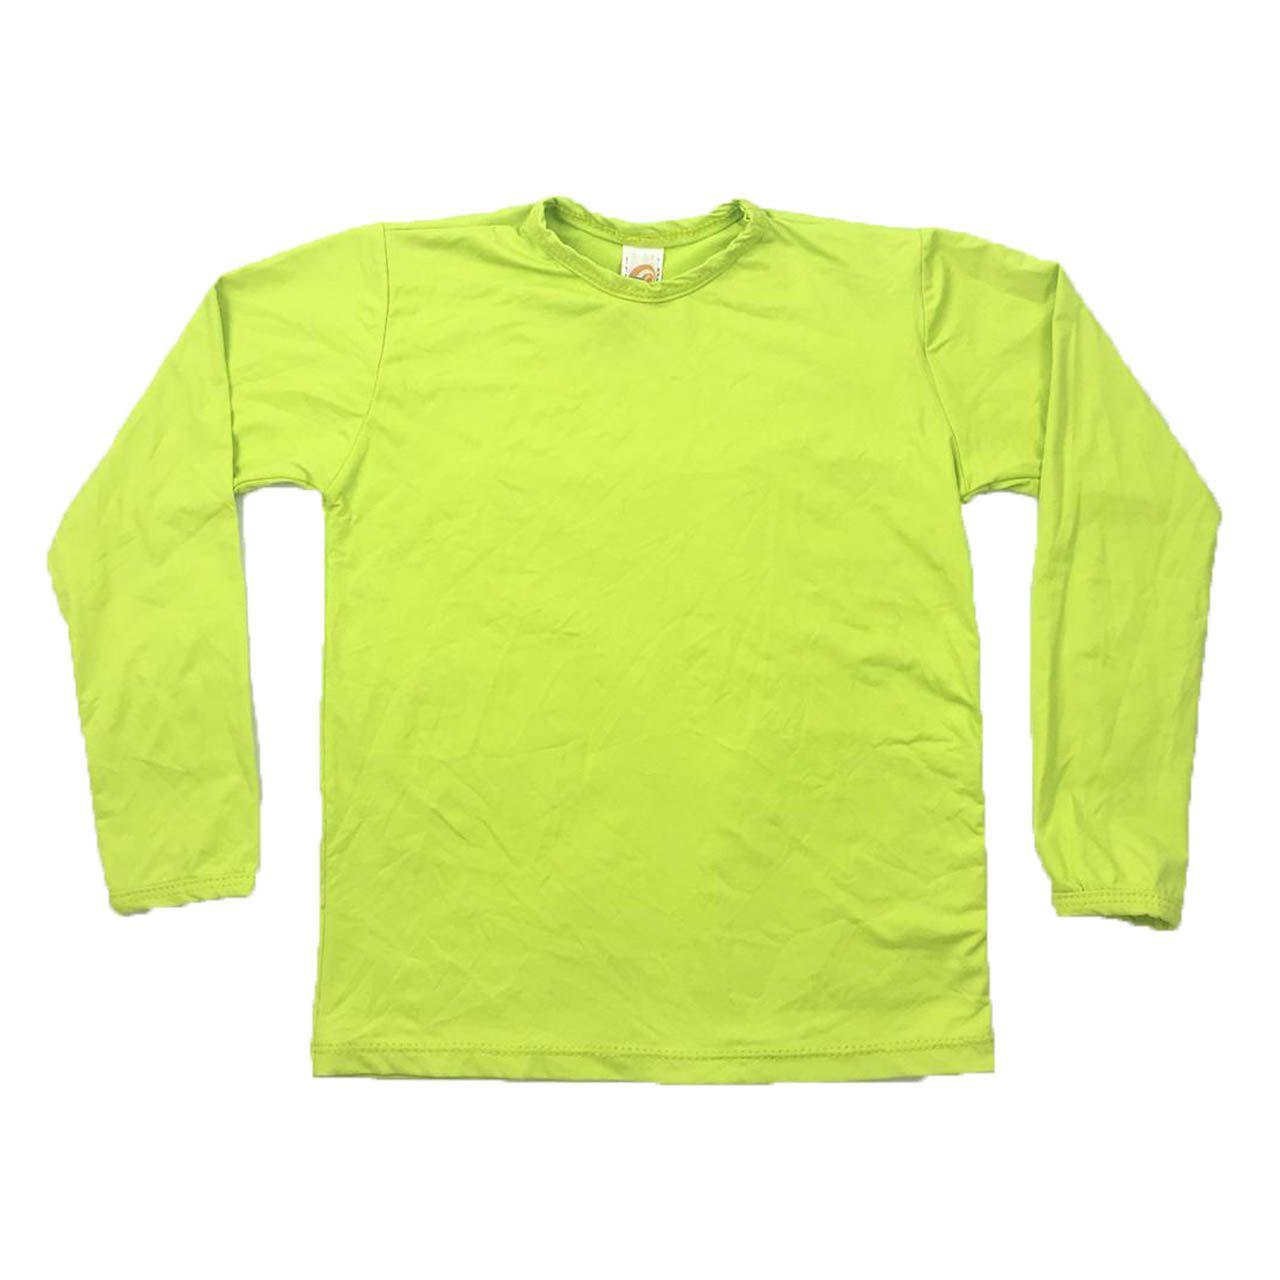 Camiseta Praia Manga Longa Hard Sports 8105